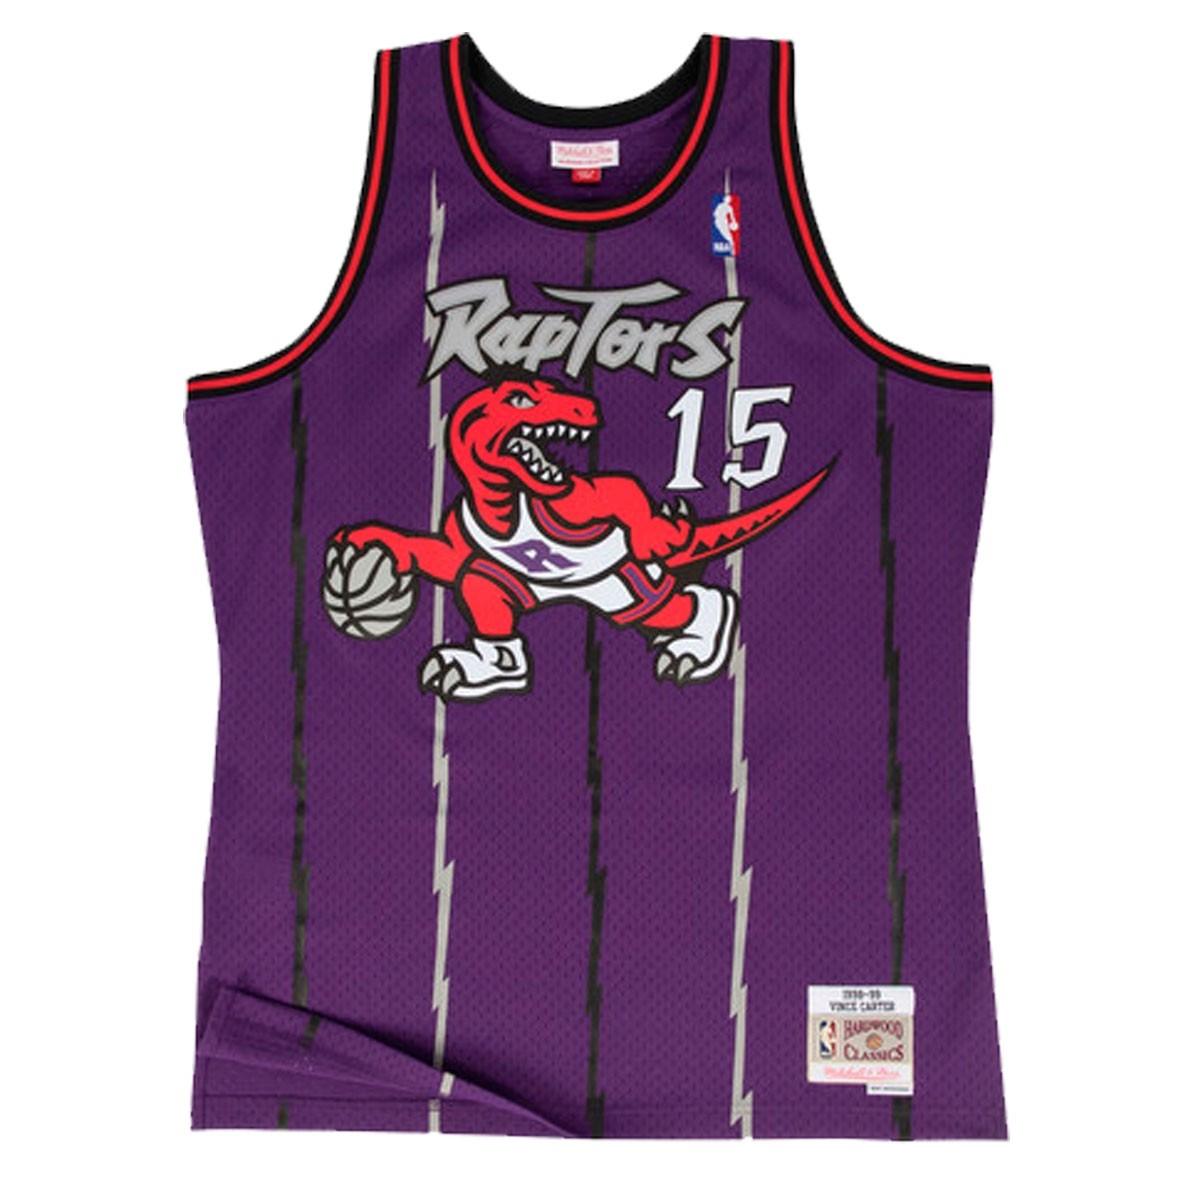 Mitchell & Ness Vince Carter Swingman Jersey Road 'Raptors'